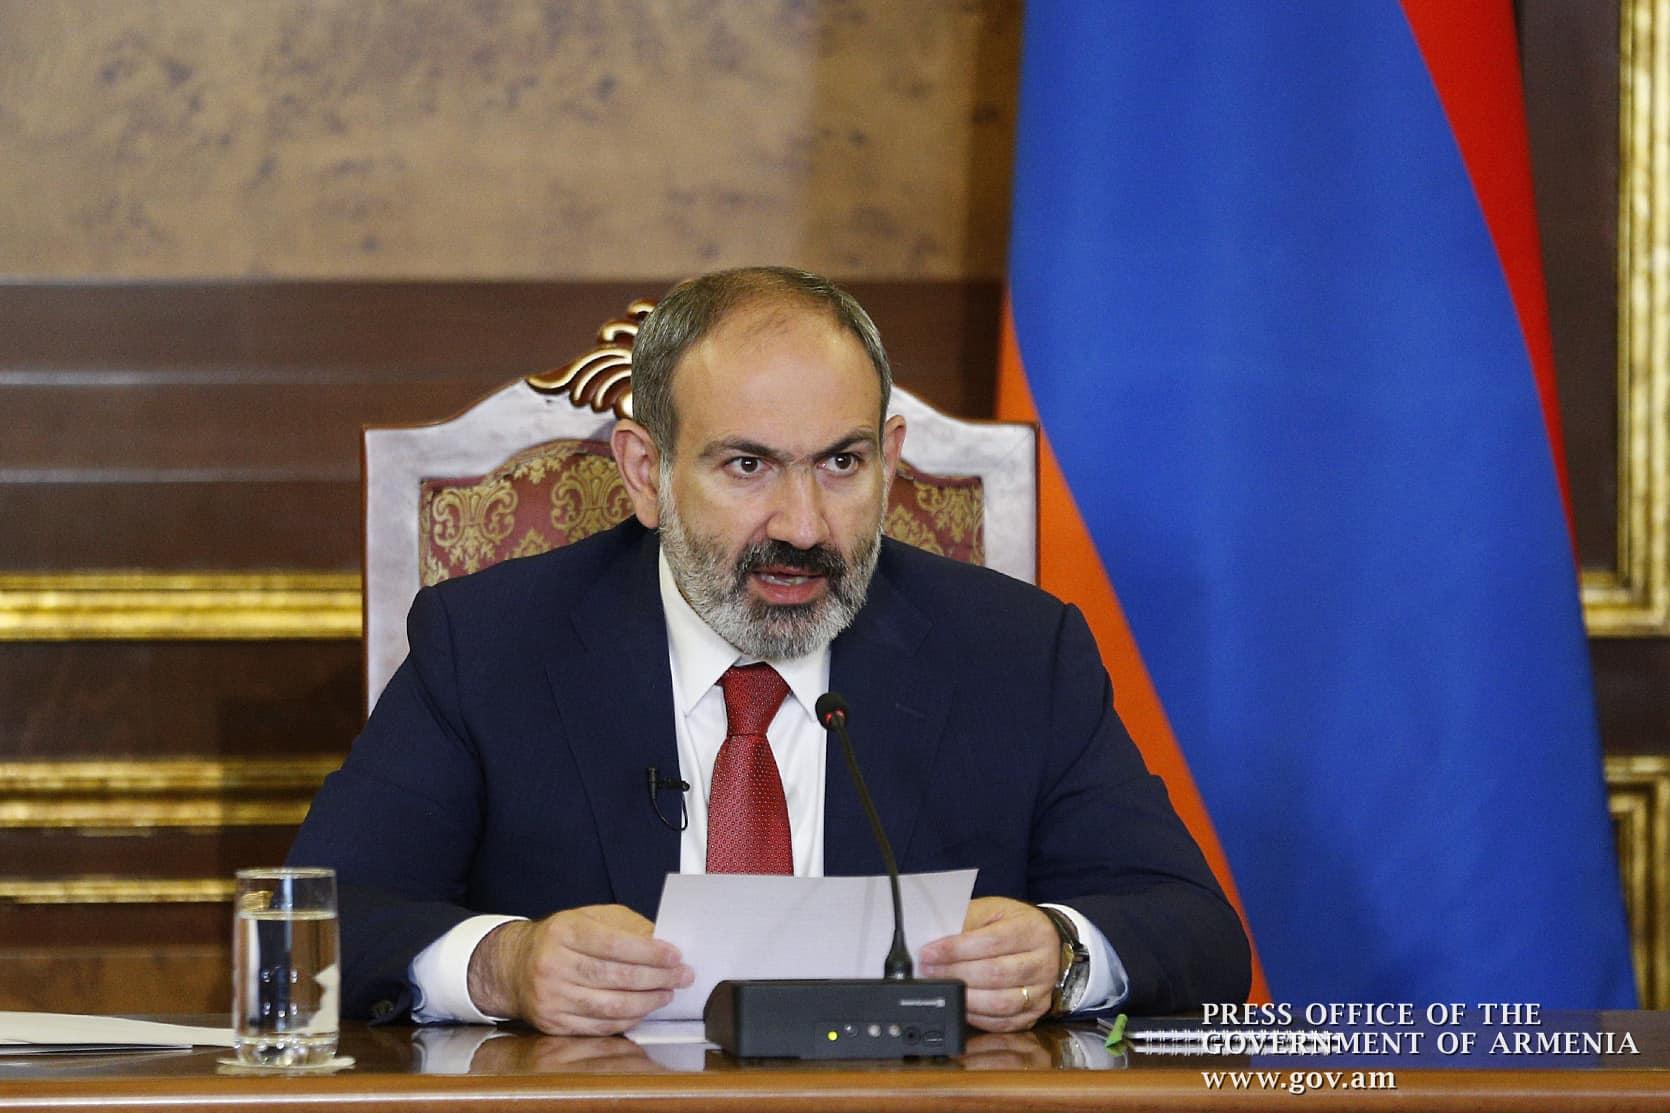 Armenia Prioritizes Food Security in Economic Support Plan